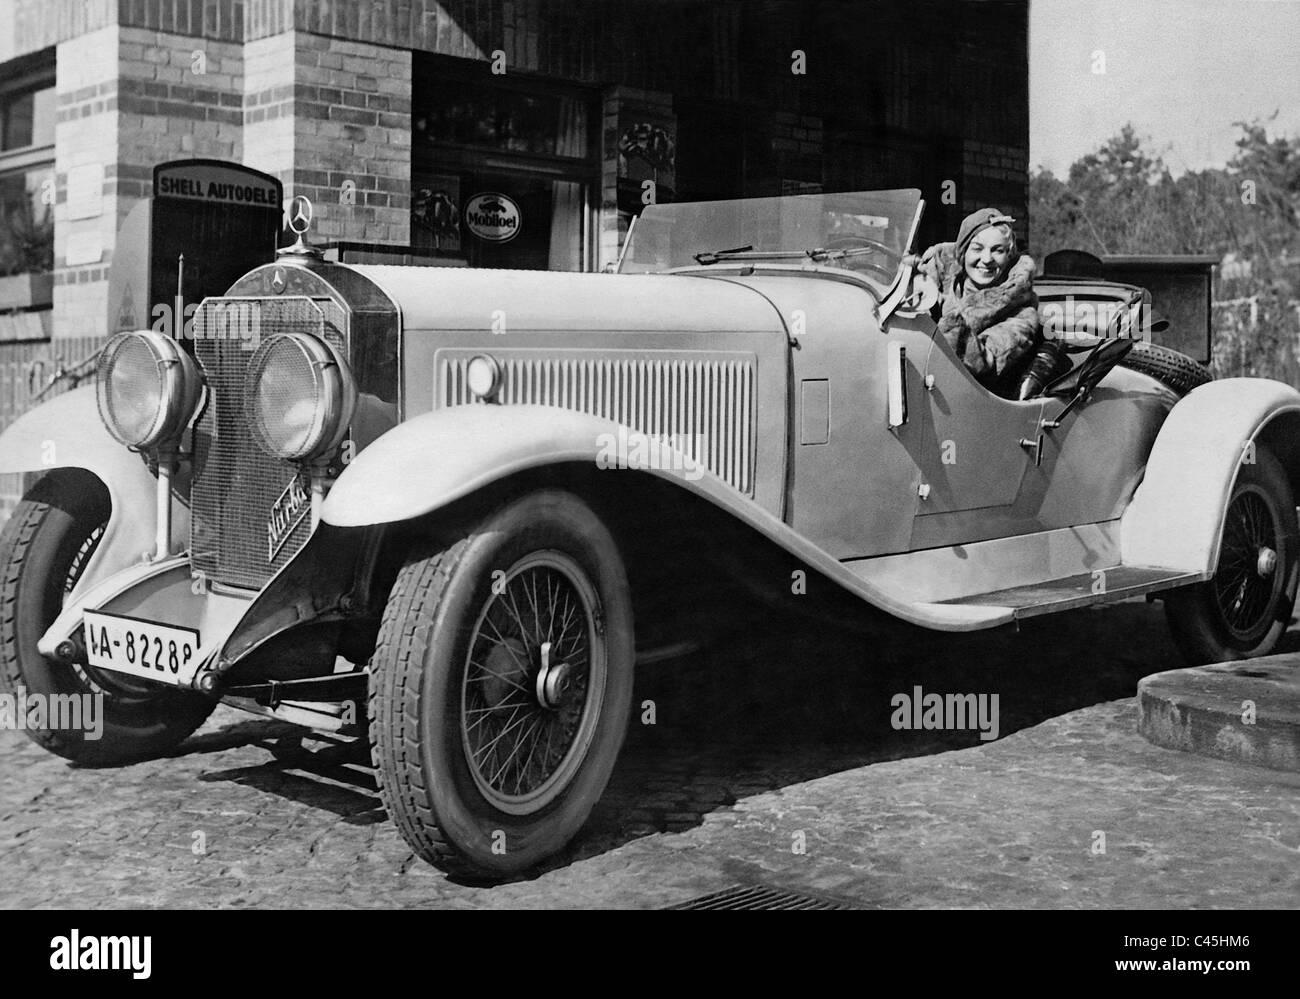 Gitta Alpar in her Mercedes-Benz sports car, the model 'Nuerburg 8', 1932 - Stock Image